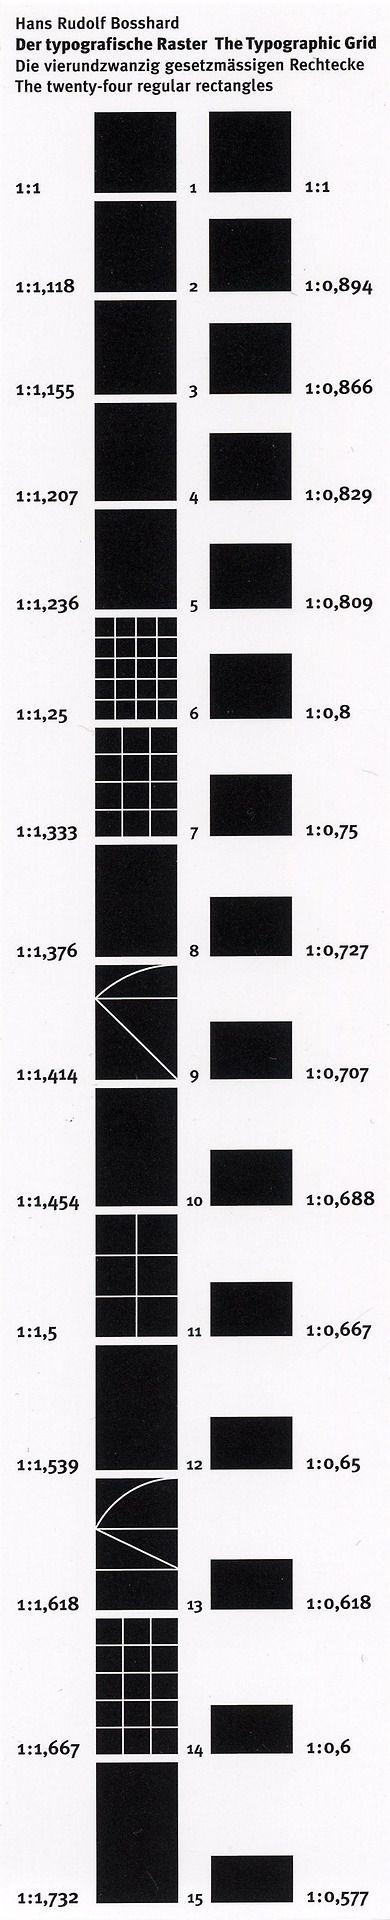 Hans Rudolf Bosshard — The typographic grid